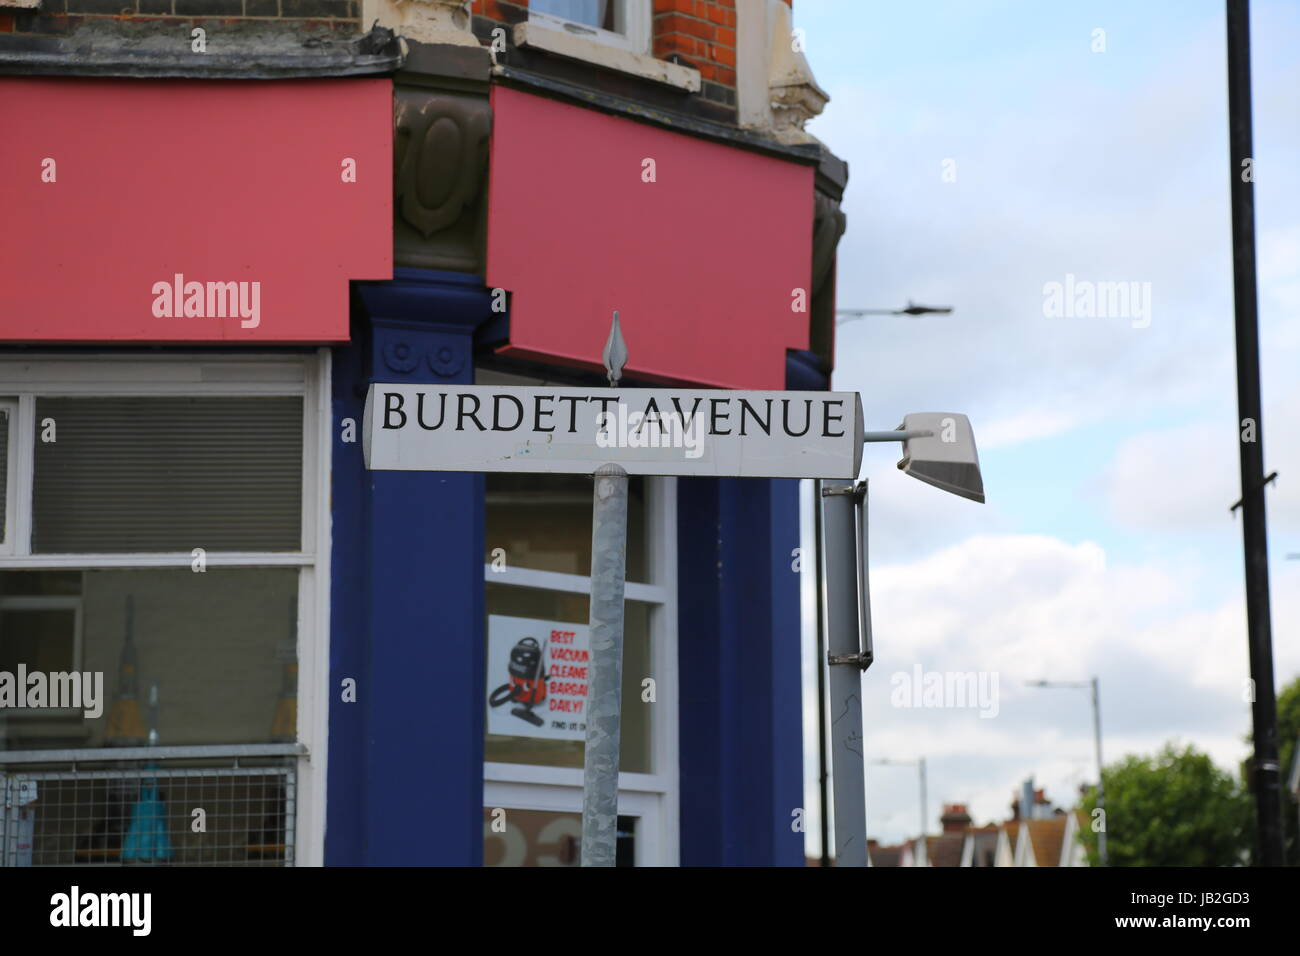 Burdett Avenue, Westcliff-on-Sea, Essex. Stock Photo